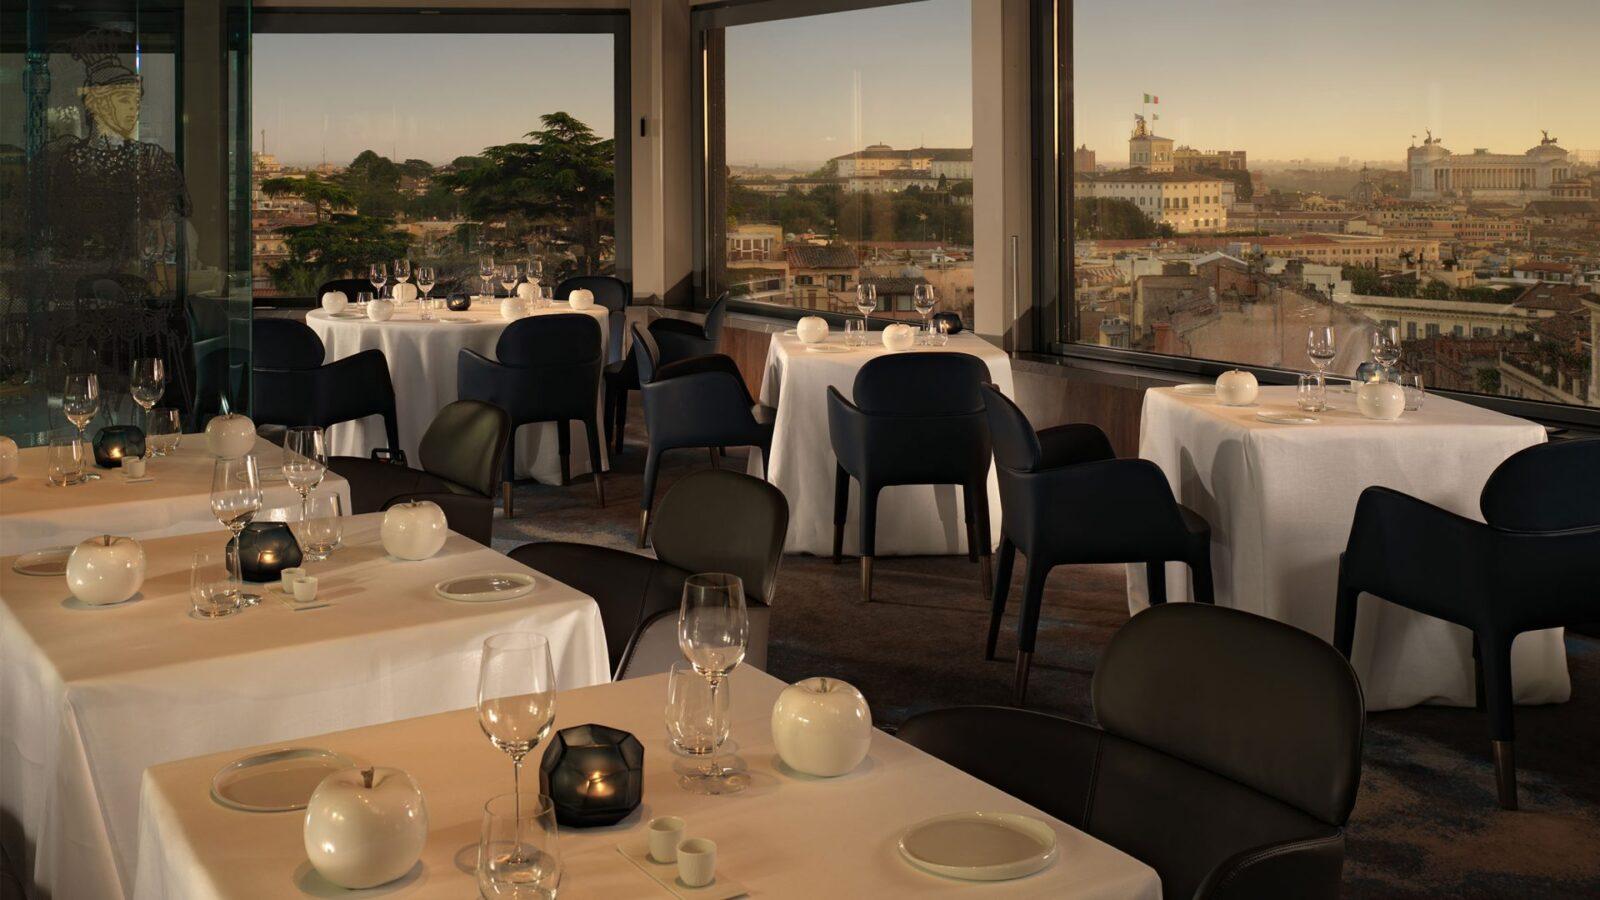 La terrazza dorchester collection - Hotel eden en roma ...